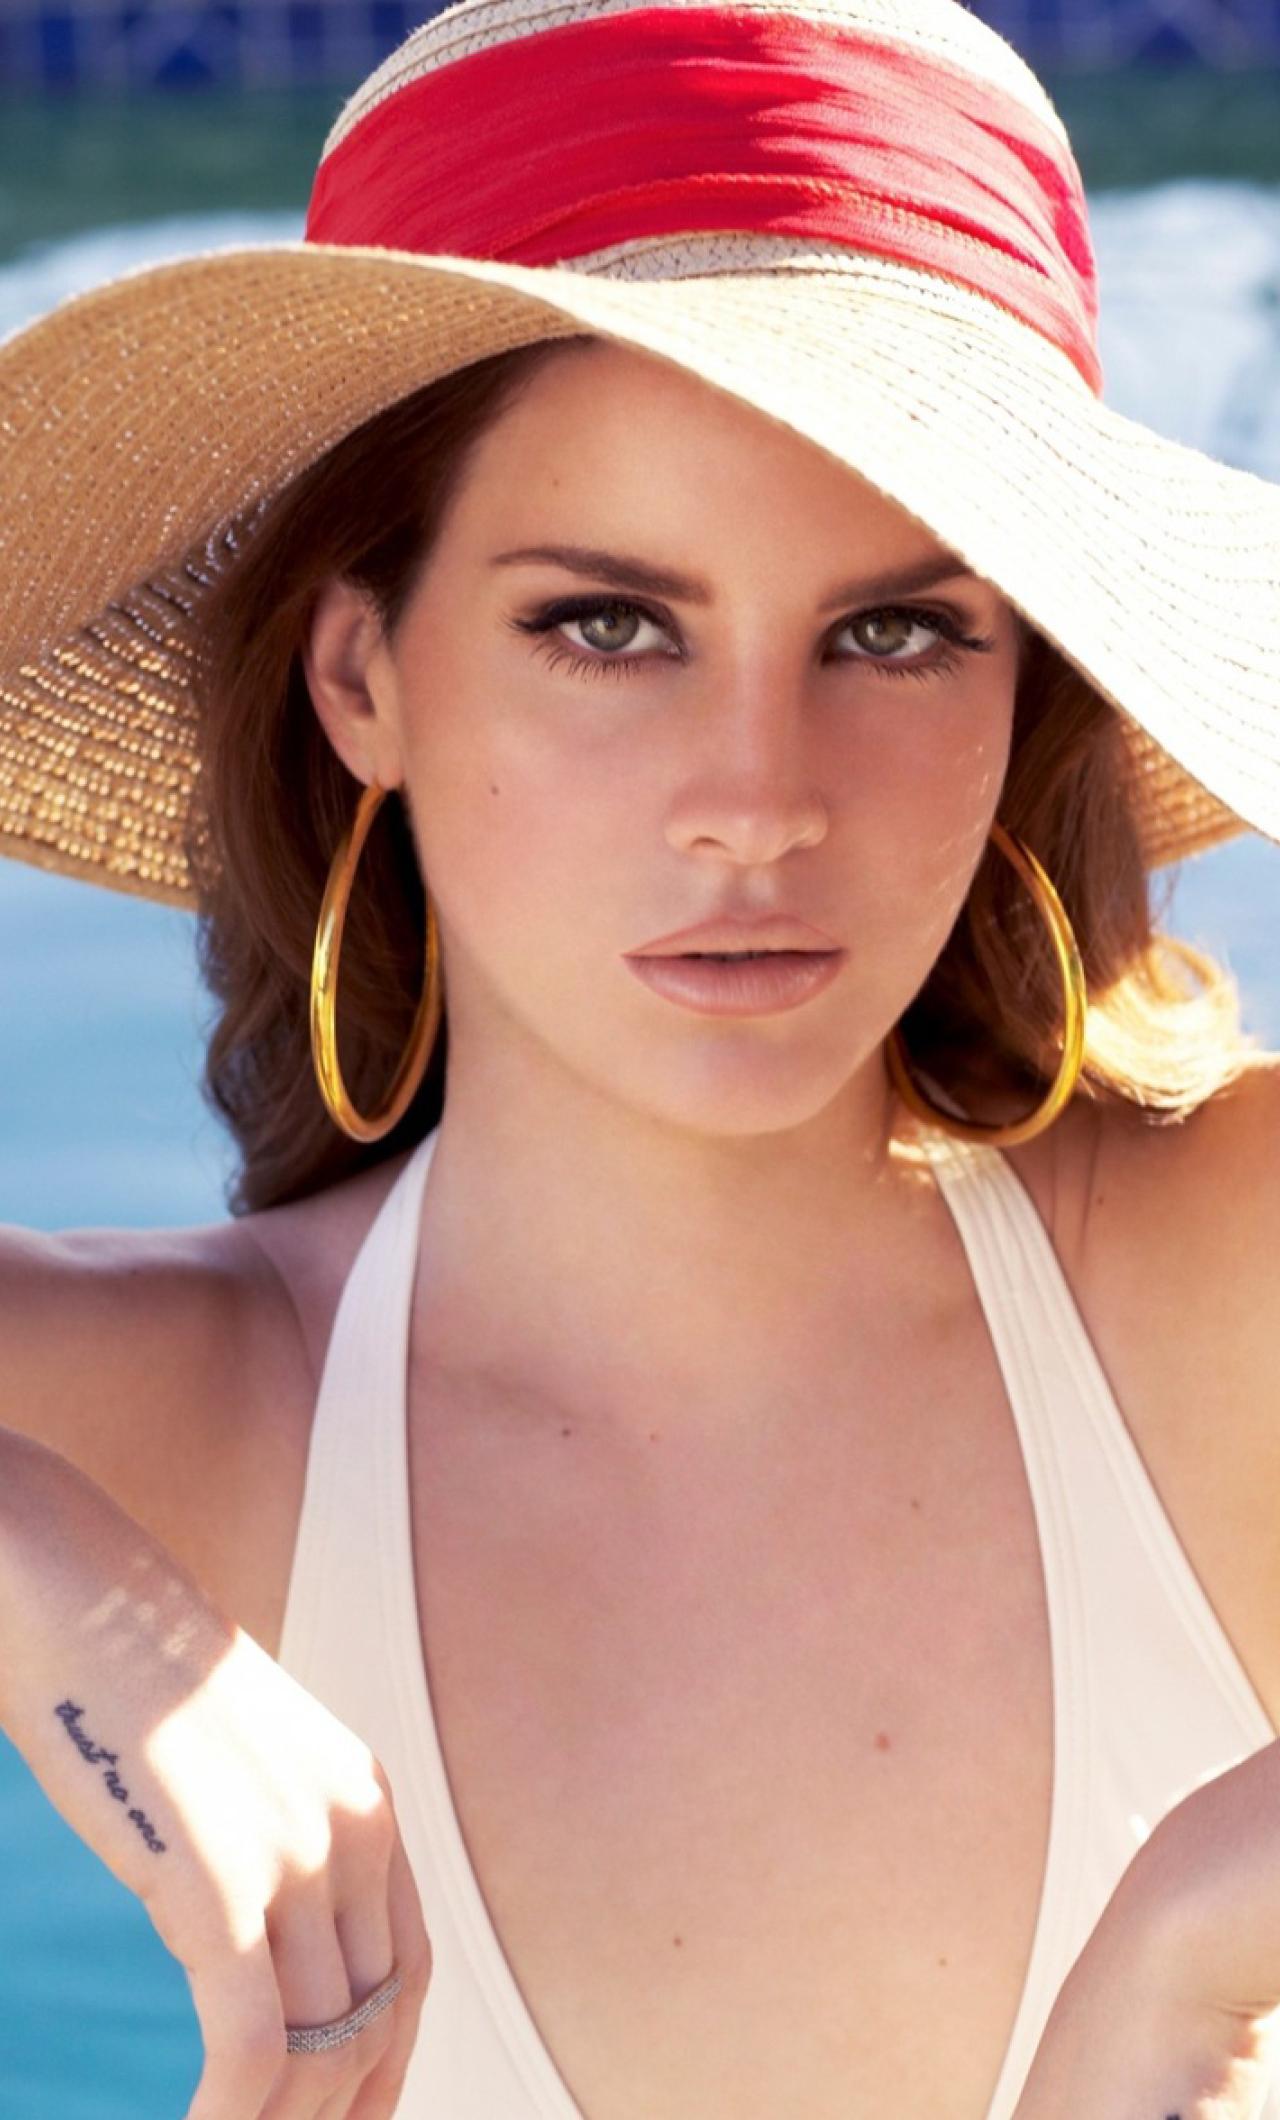 1280x2120 Lana Del Rey Trust No One Wallpapers Iphone 6 Plus